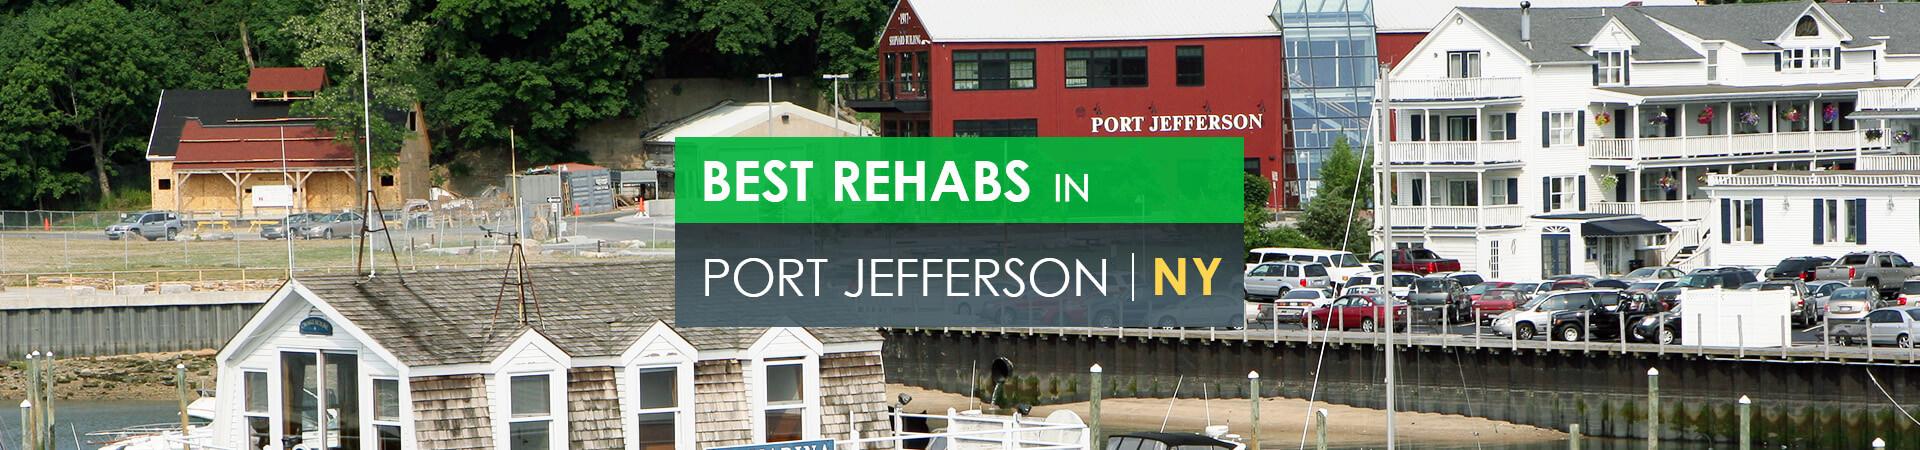 Best rehabs in Port Jefferson, NY